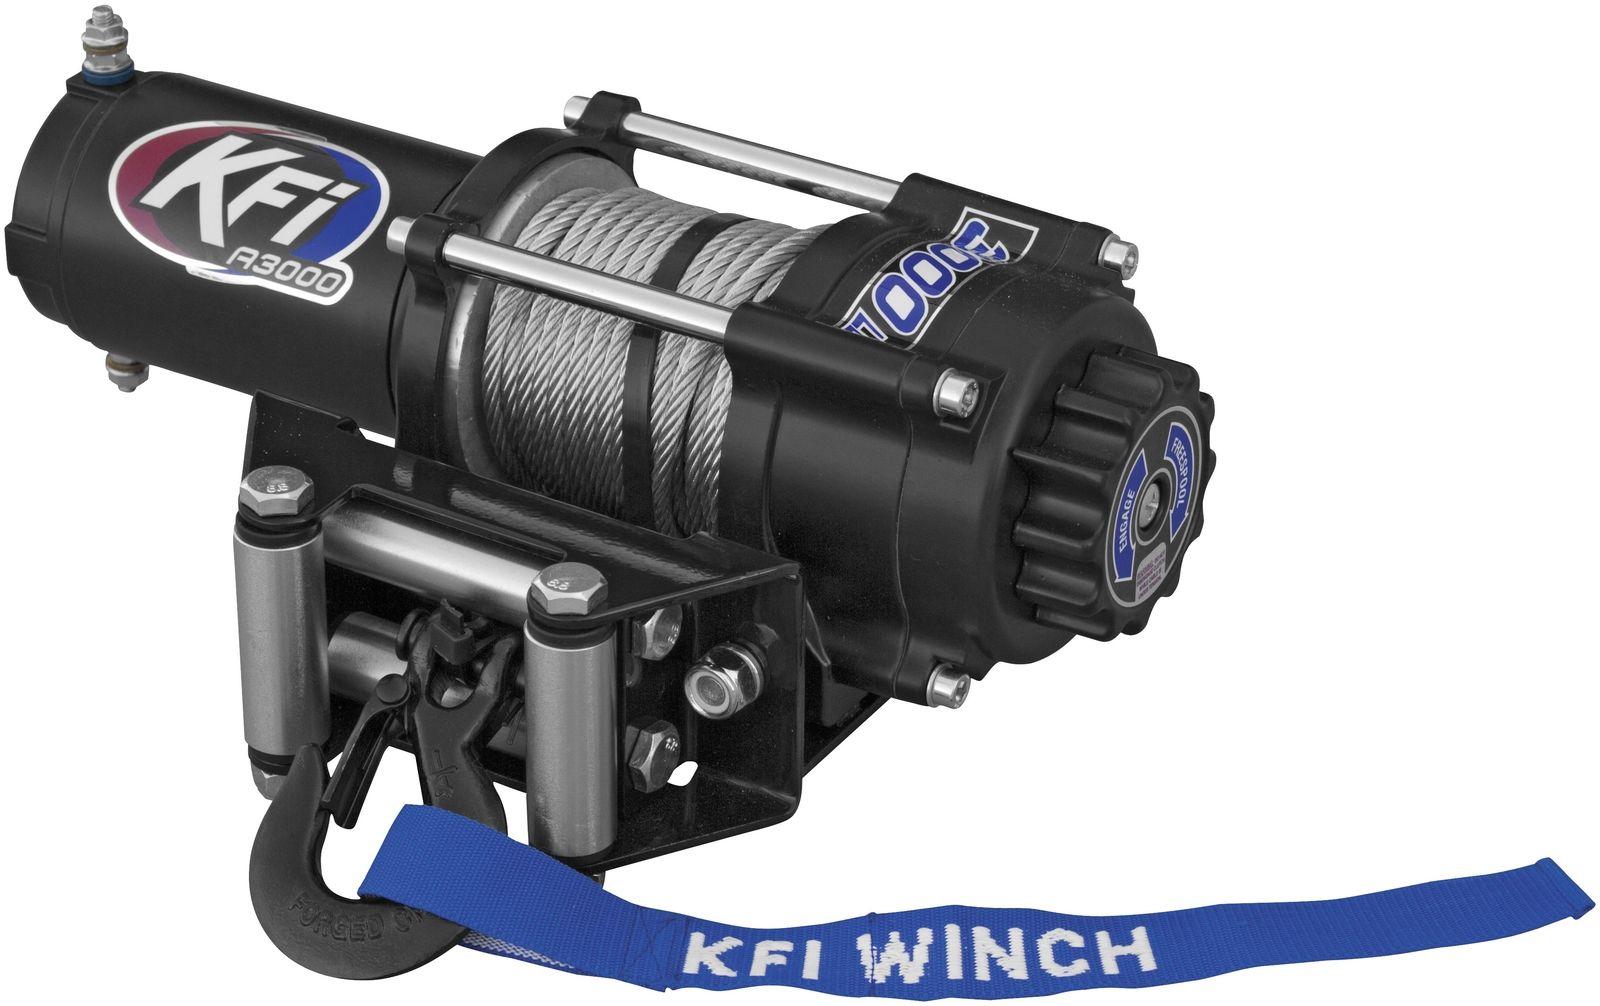 Kfi 2500 Lb Winch Set And Mounting Kit fits Polaris Trail Boss 350L  4x4 90-93